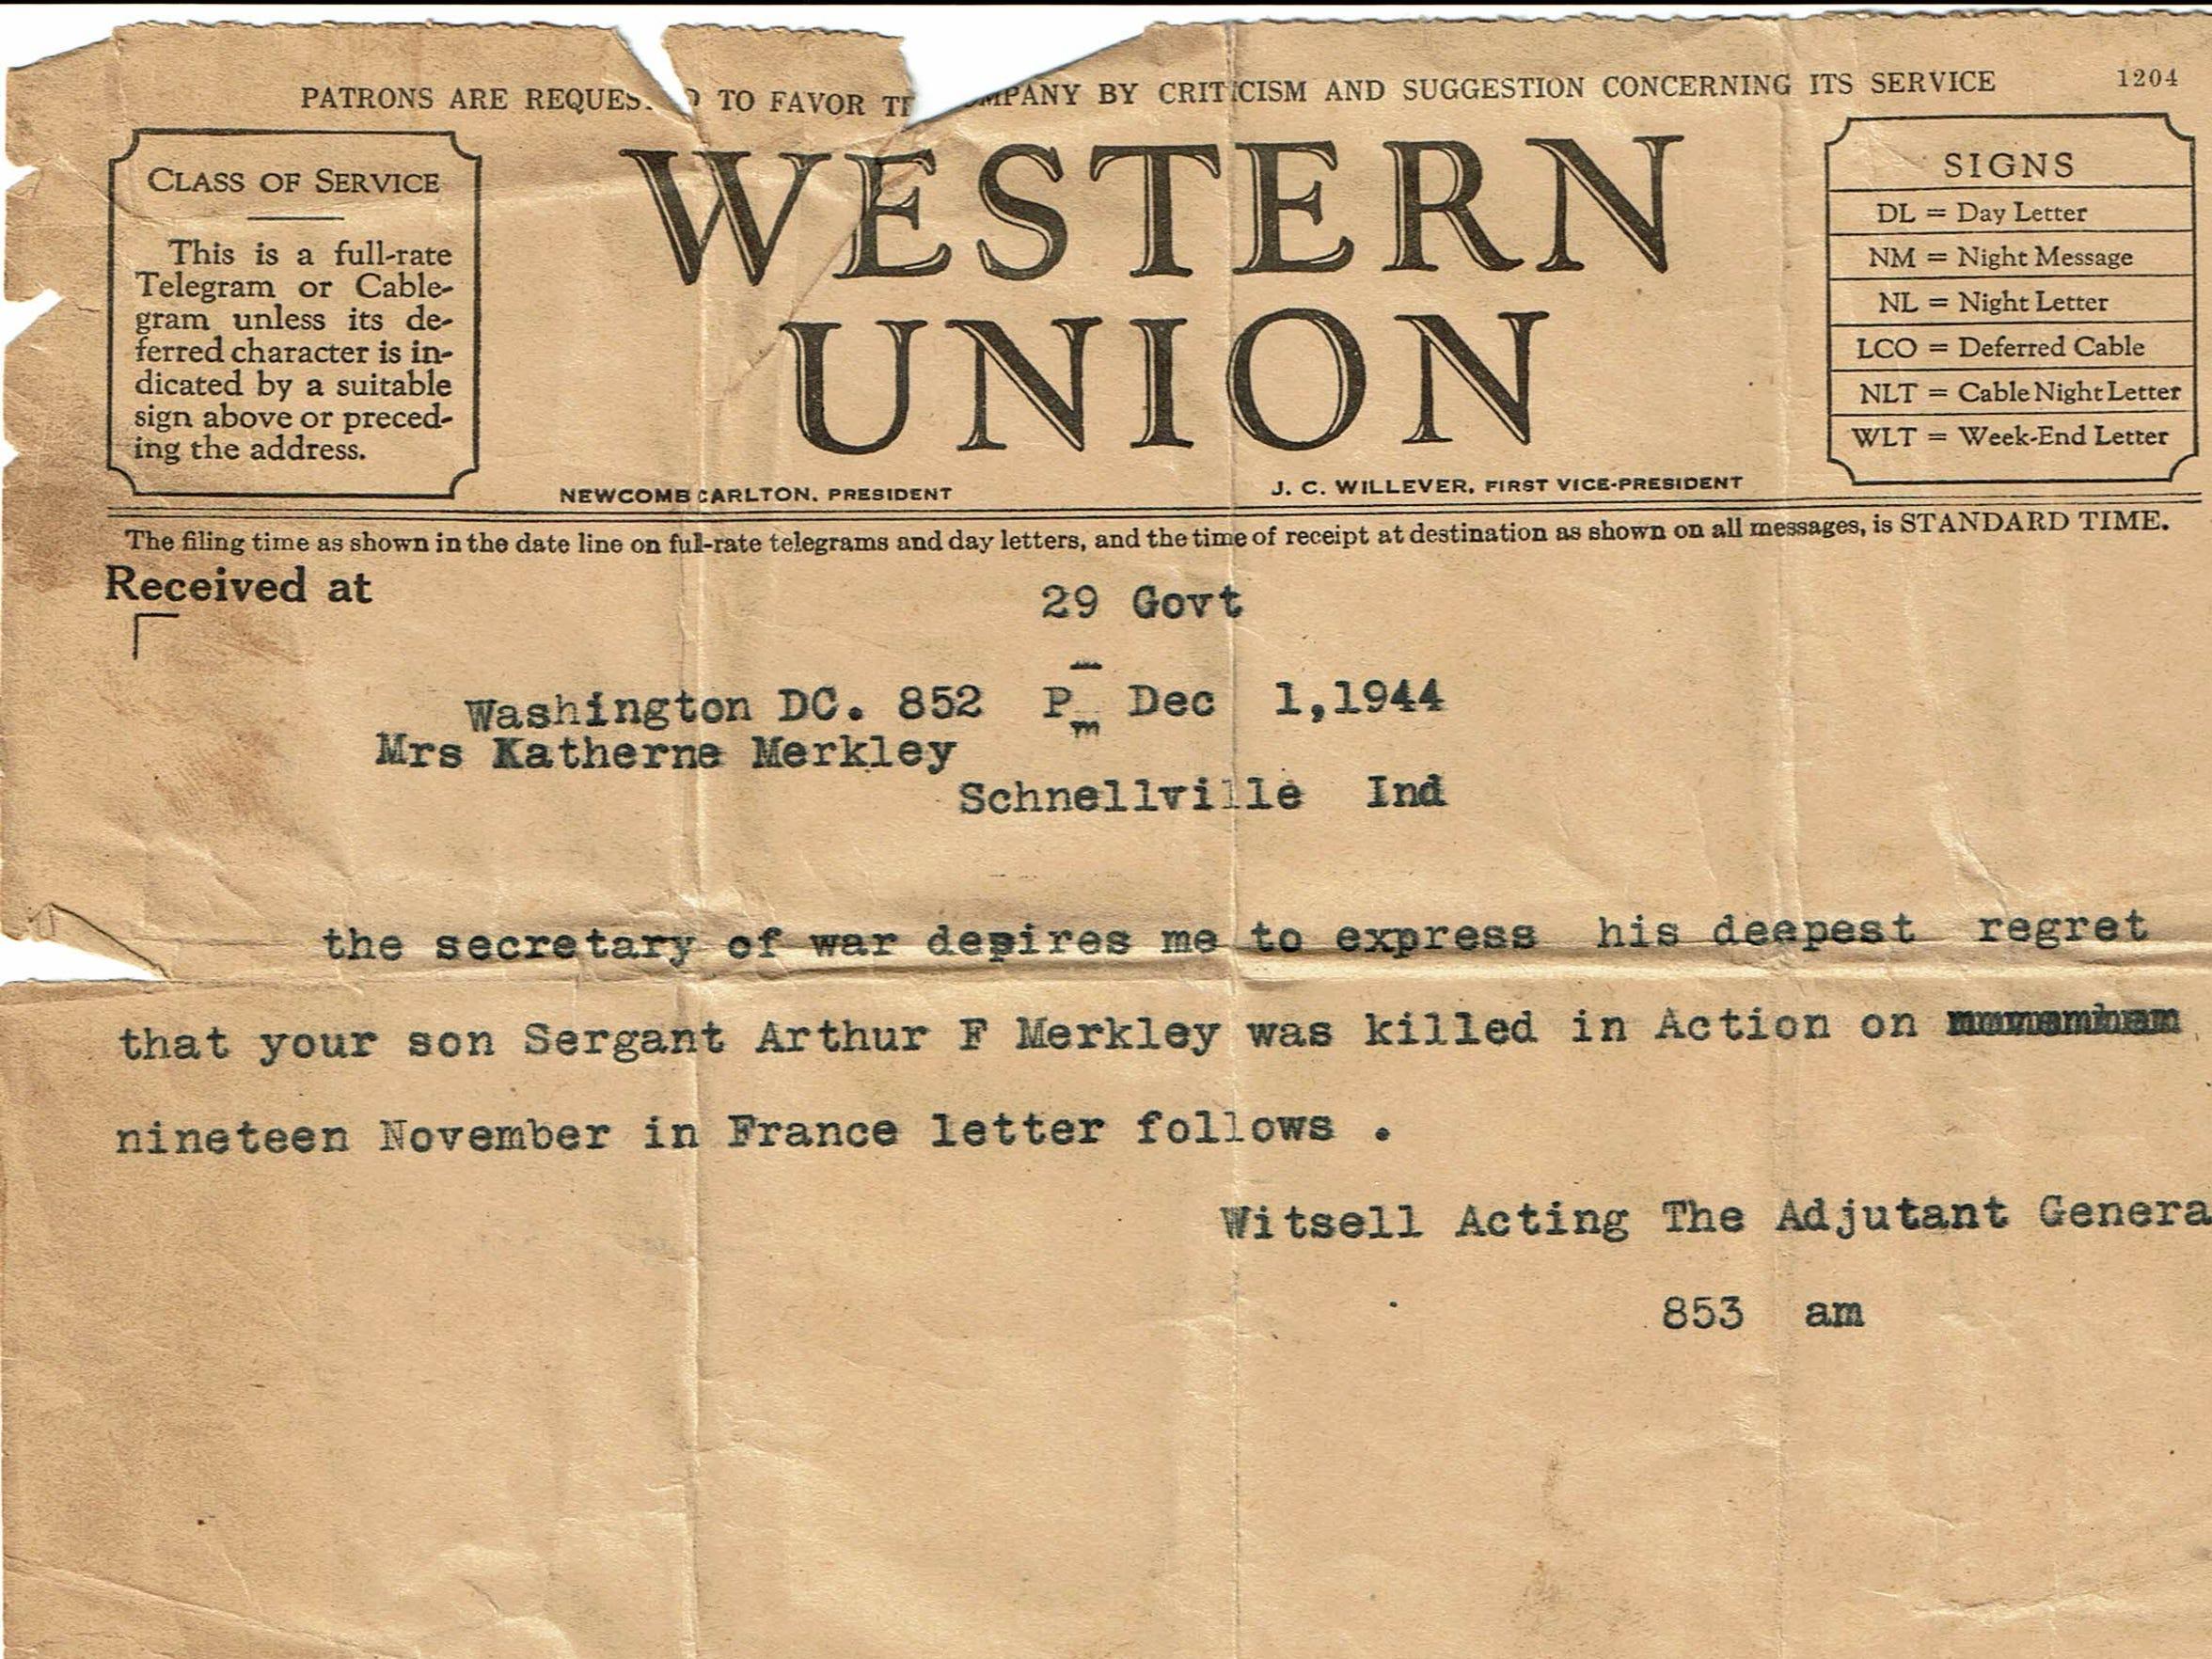 The telegram notifying the Merkley family that their